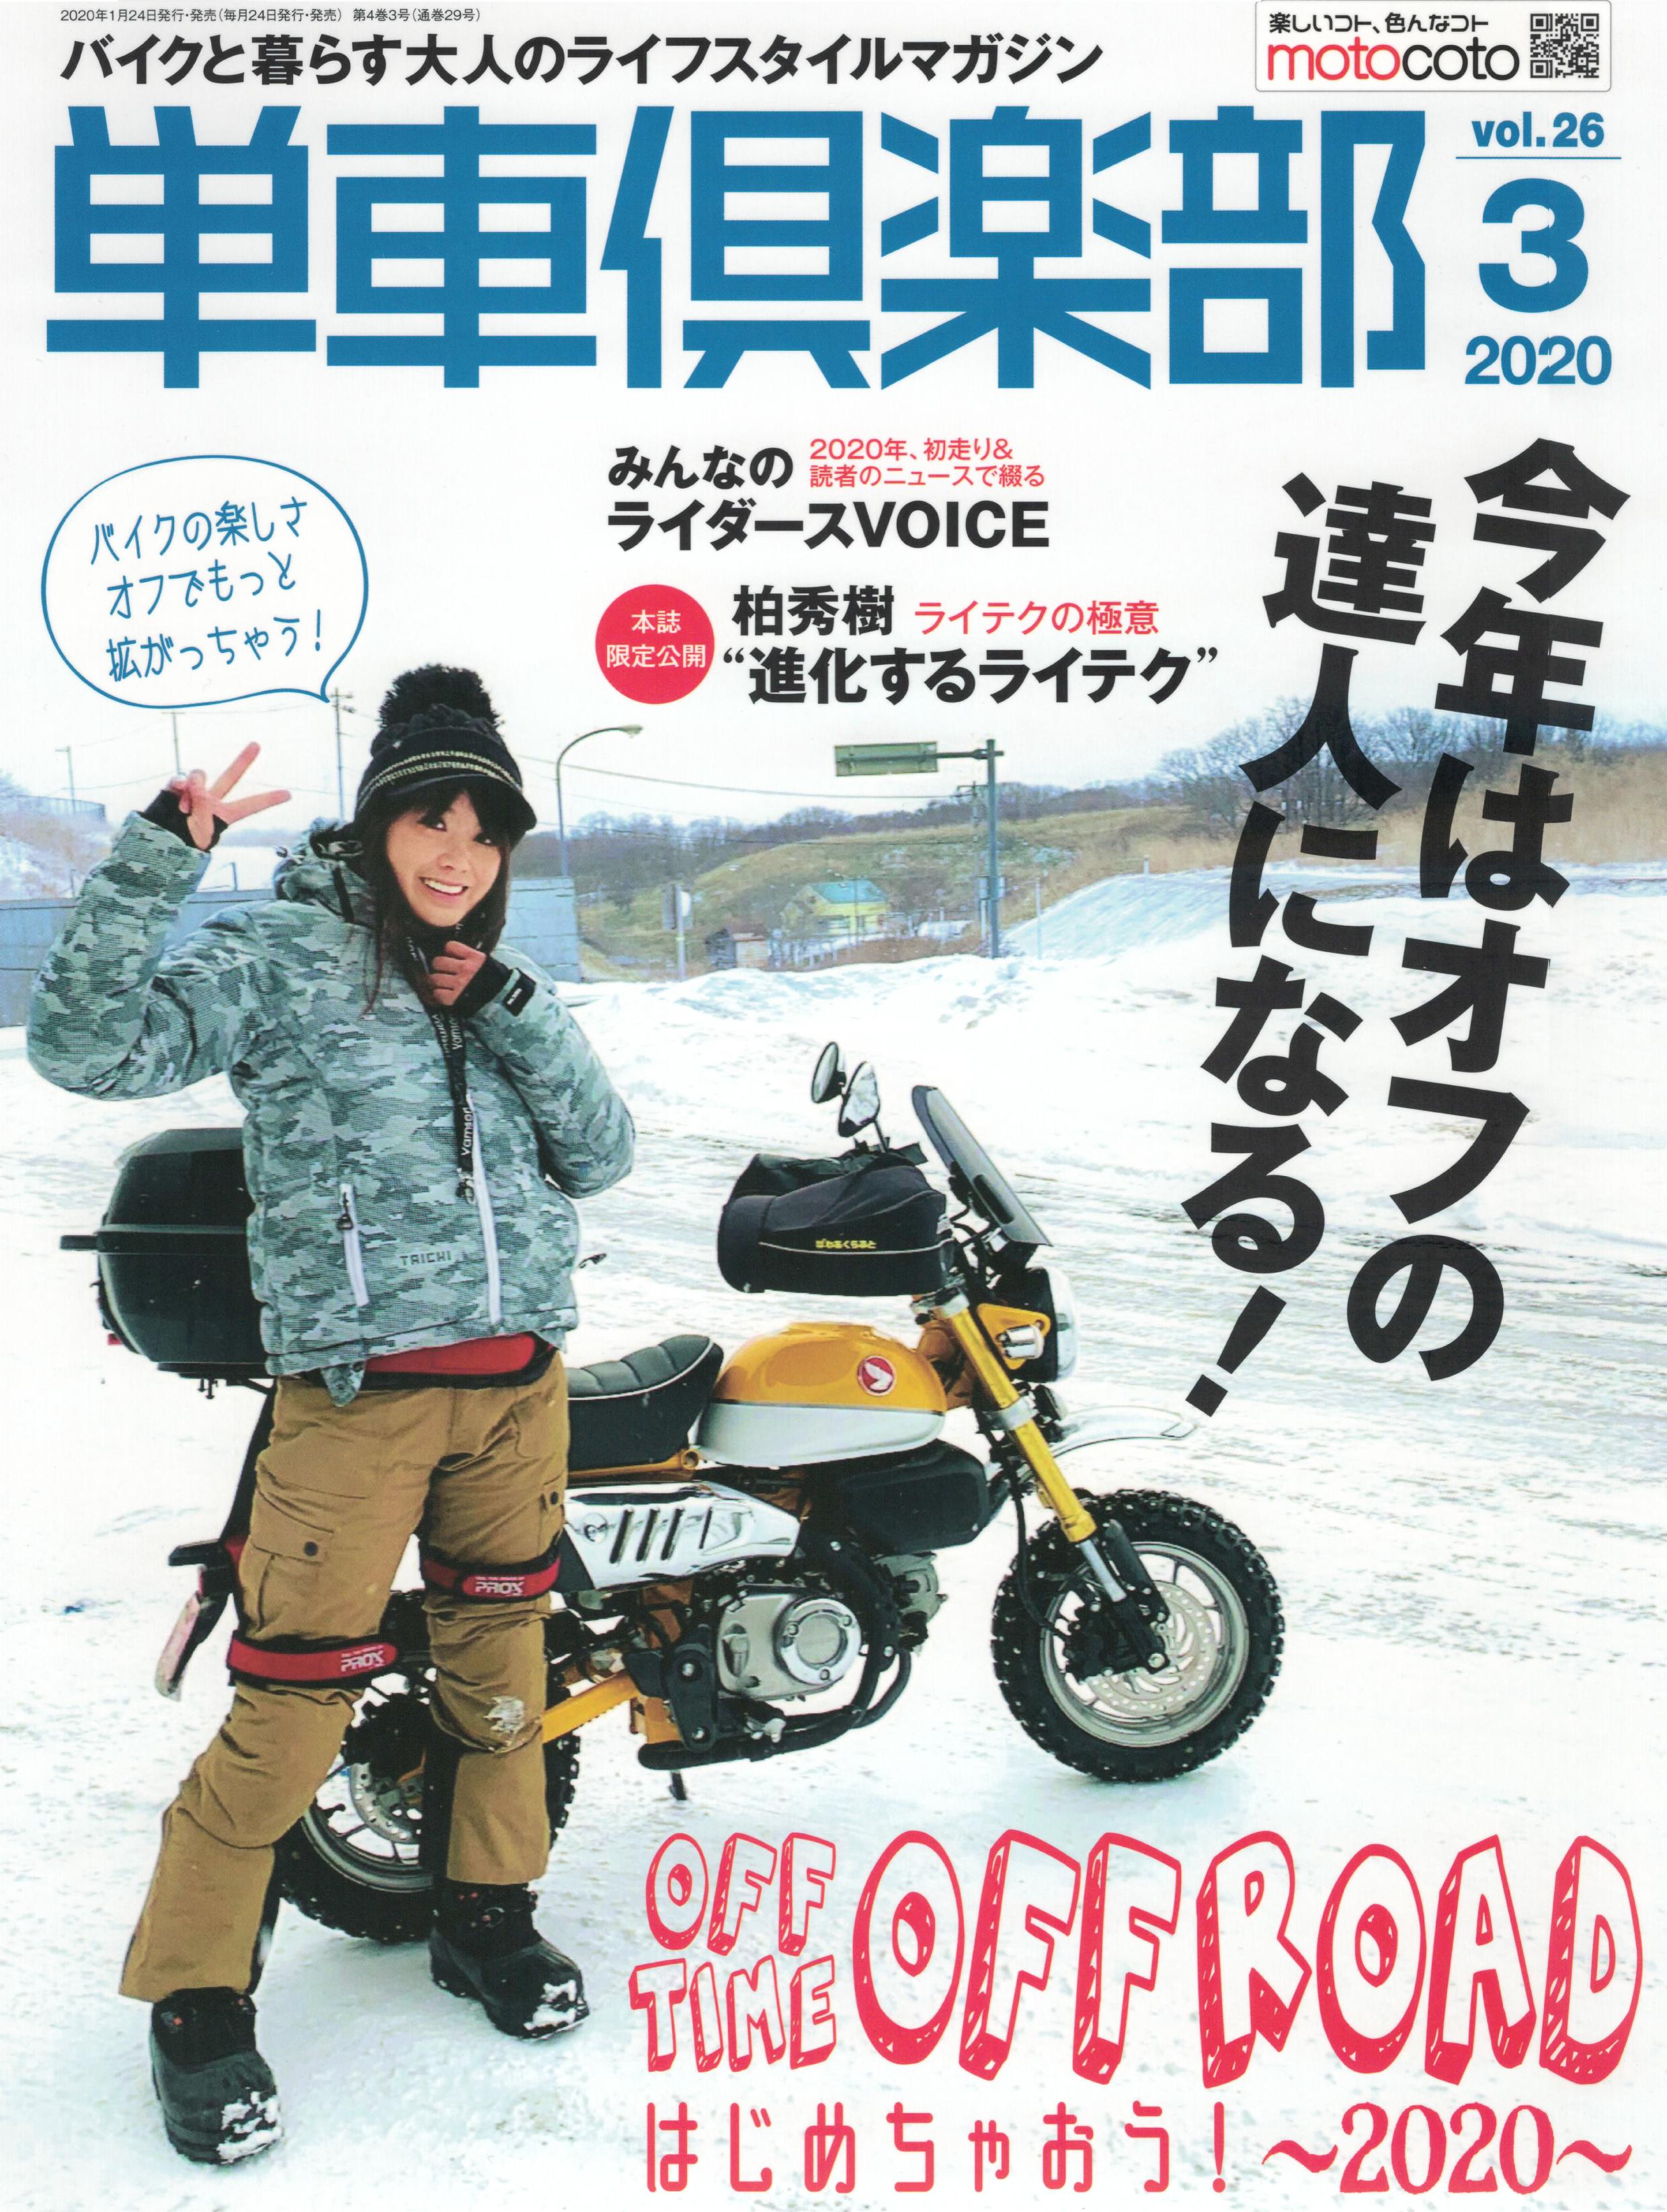 【単車倶楽部3月号掲載】FANTIC CABALLERO RALLY500